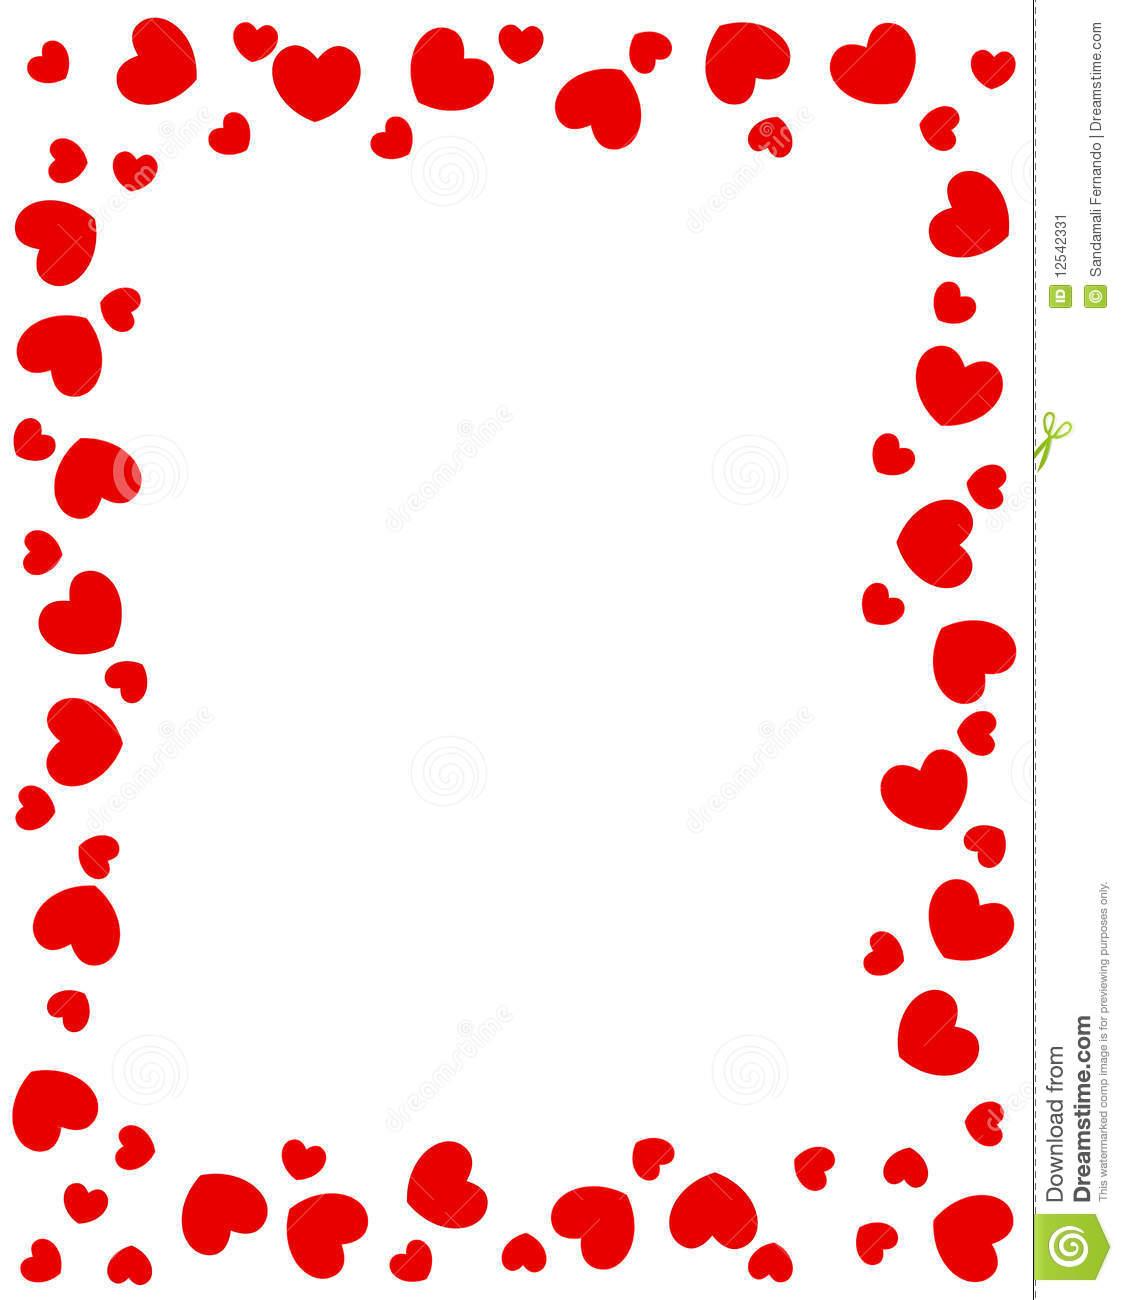 heart border clipart best decorative borders clip art free download christmas borders clip art free downloads